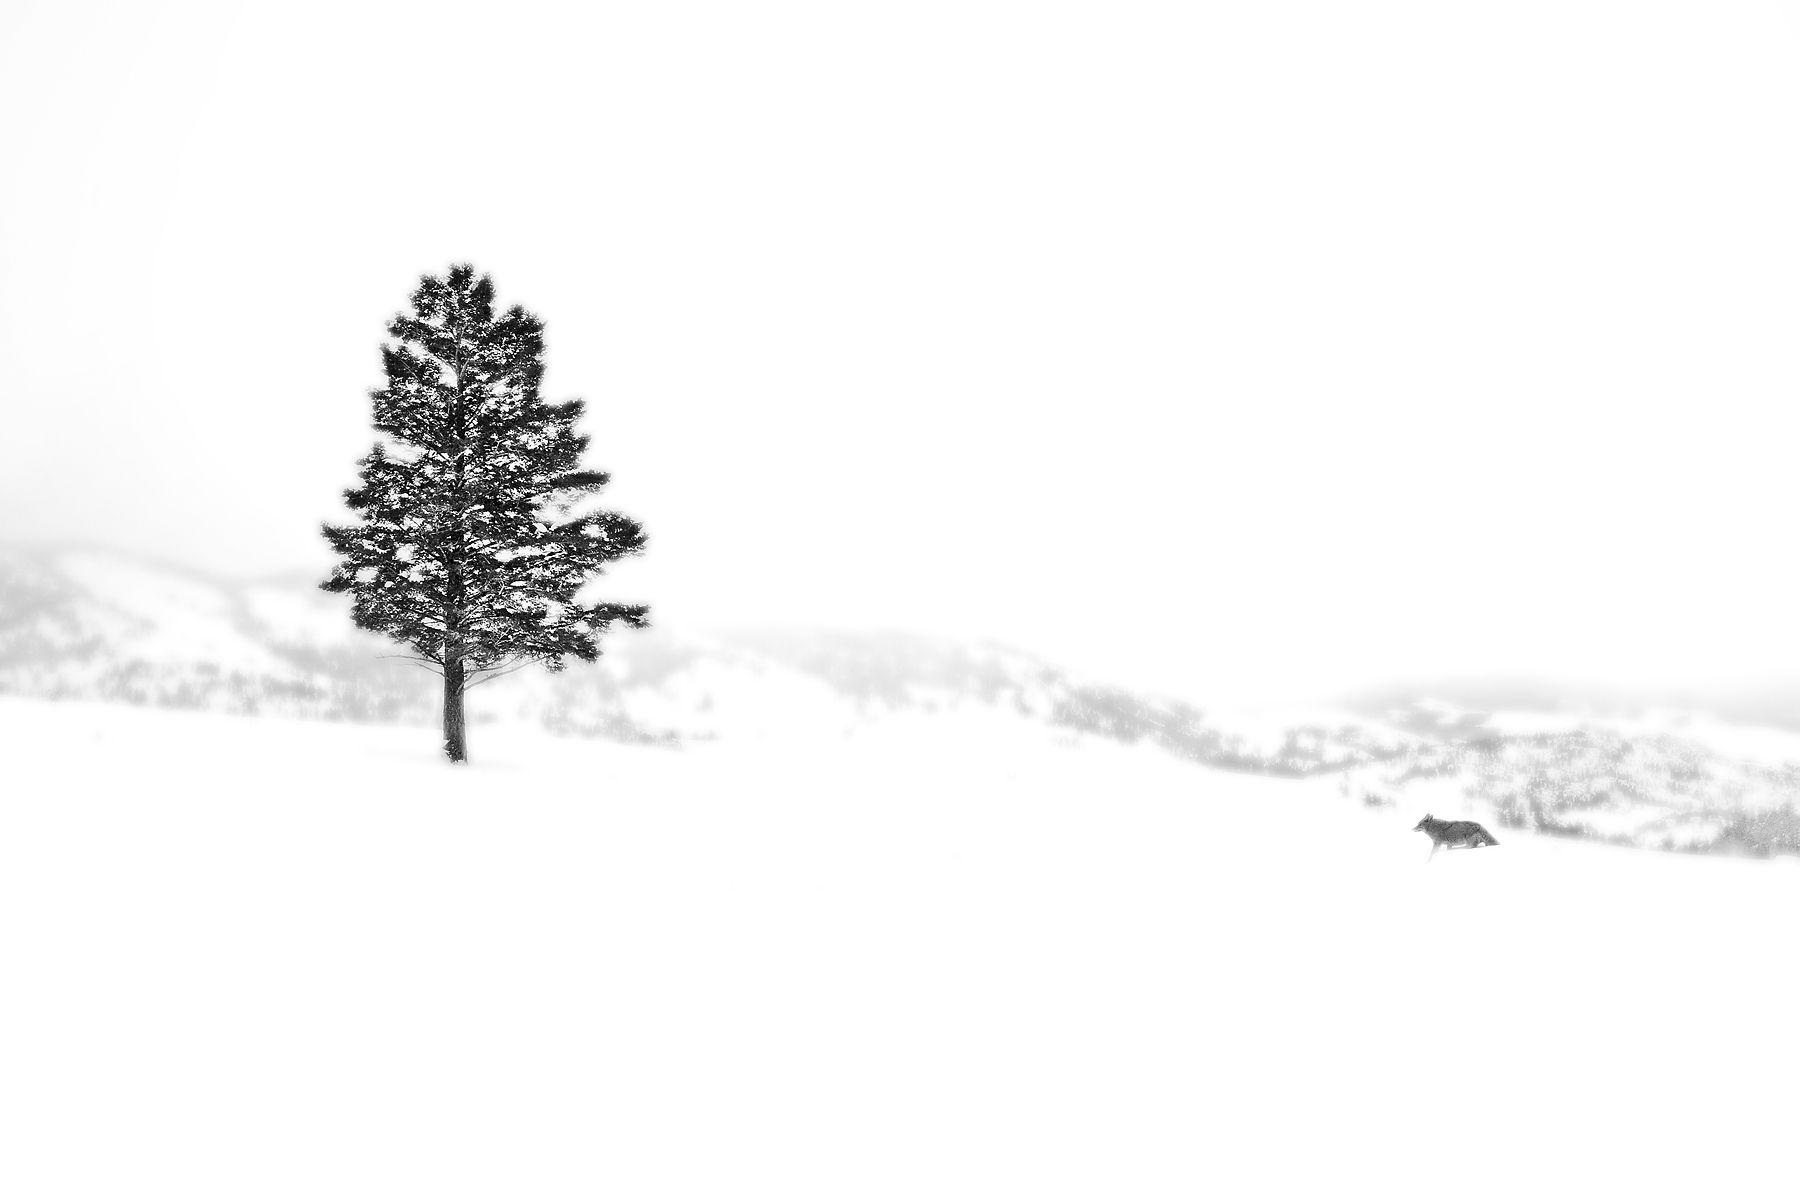 1pinetree_coyote_snow.jpg